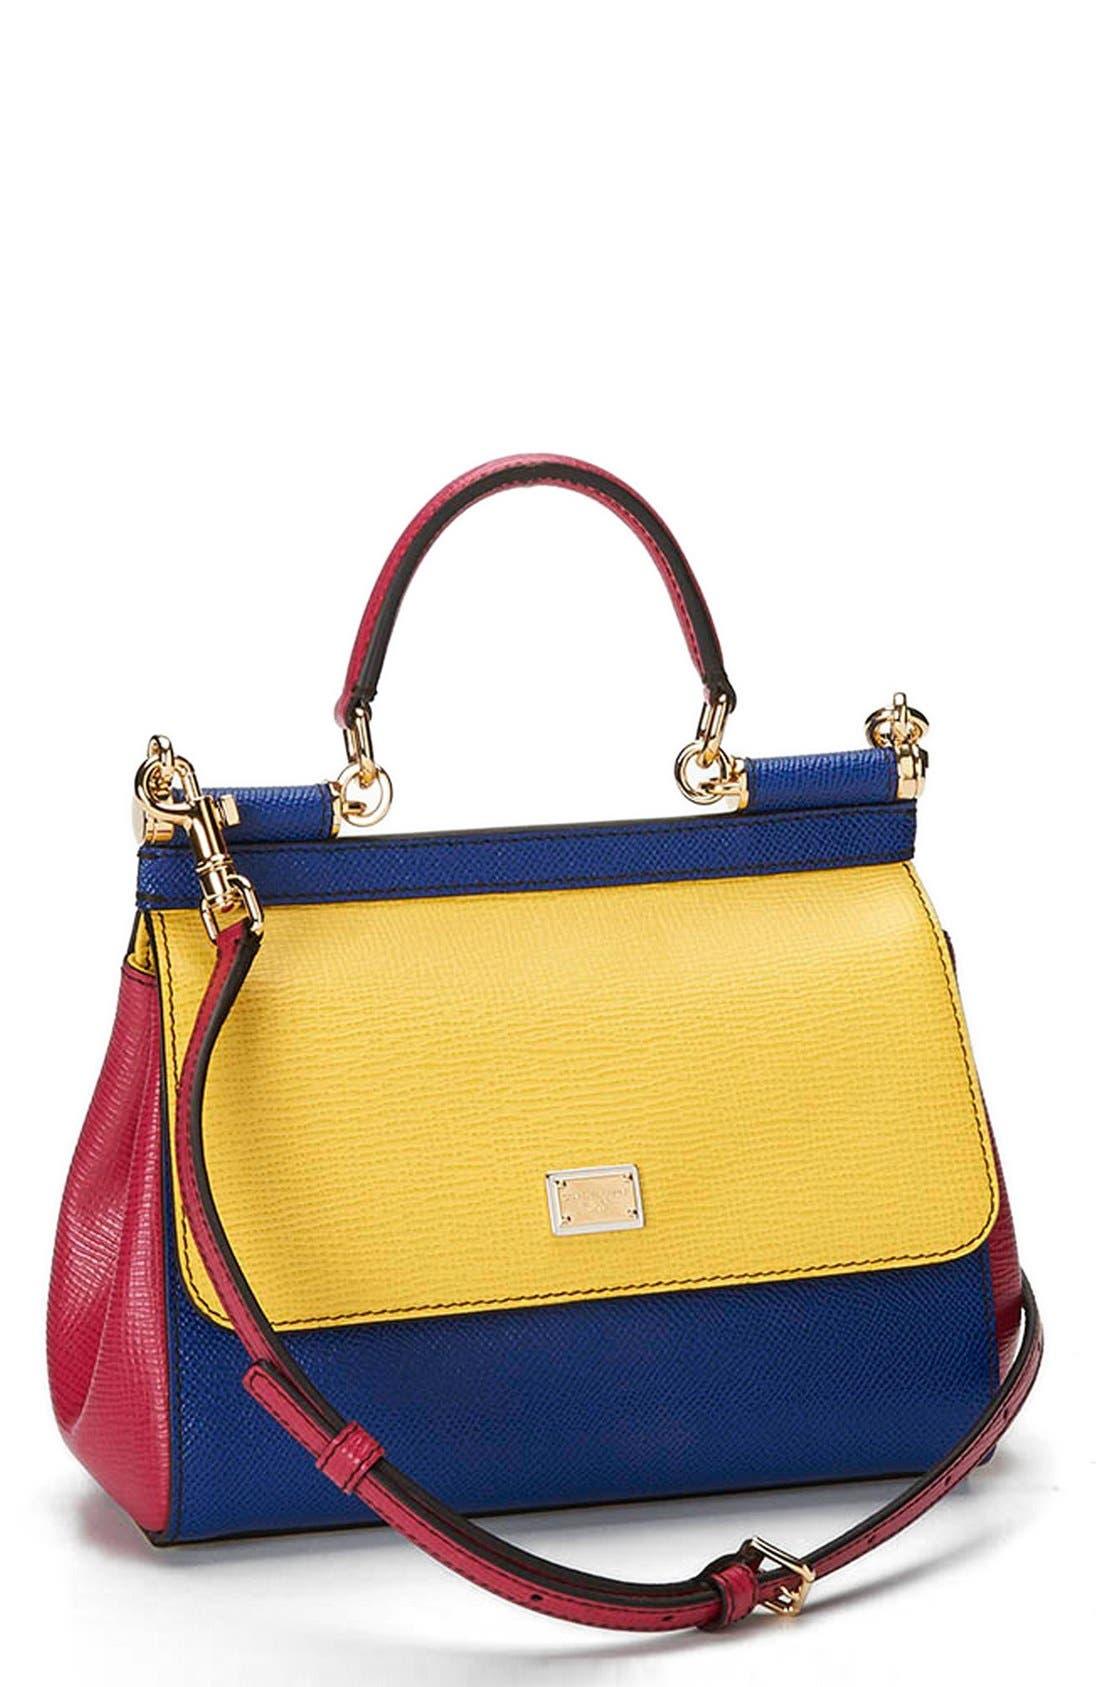 Alternate Image 1 Selected - Dolce&Gabbana 'Mini Miss Sicily' Colorblock Leather Satchel